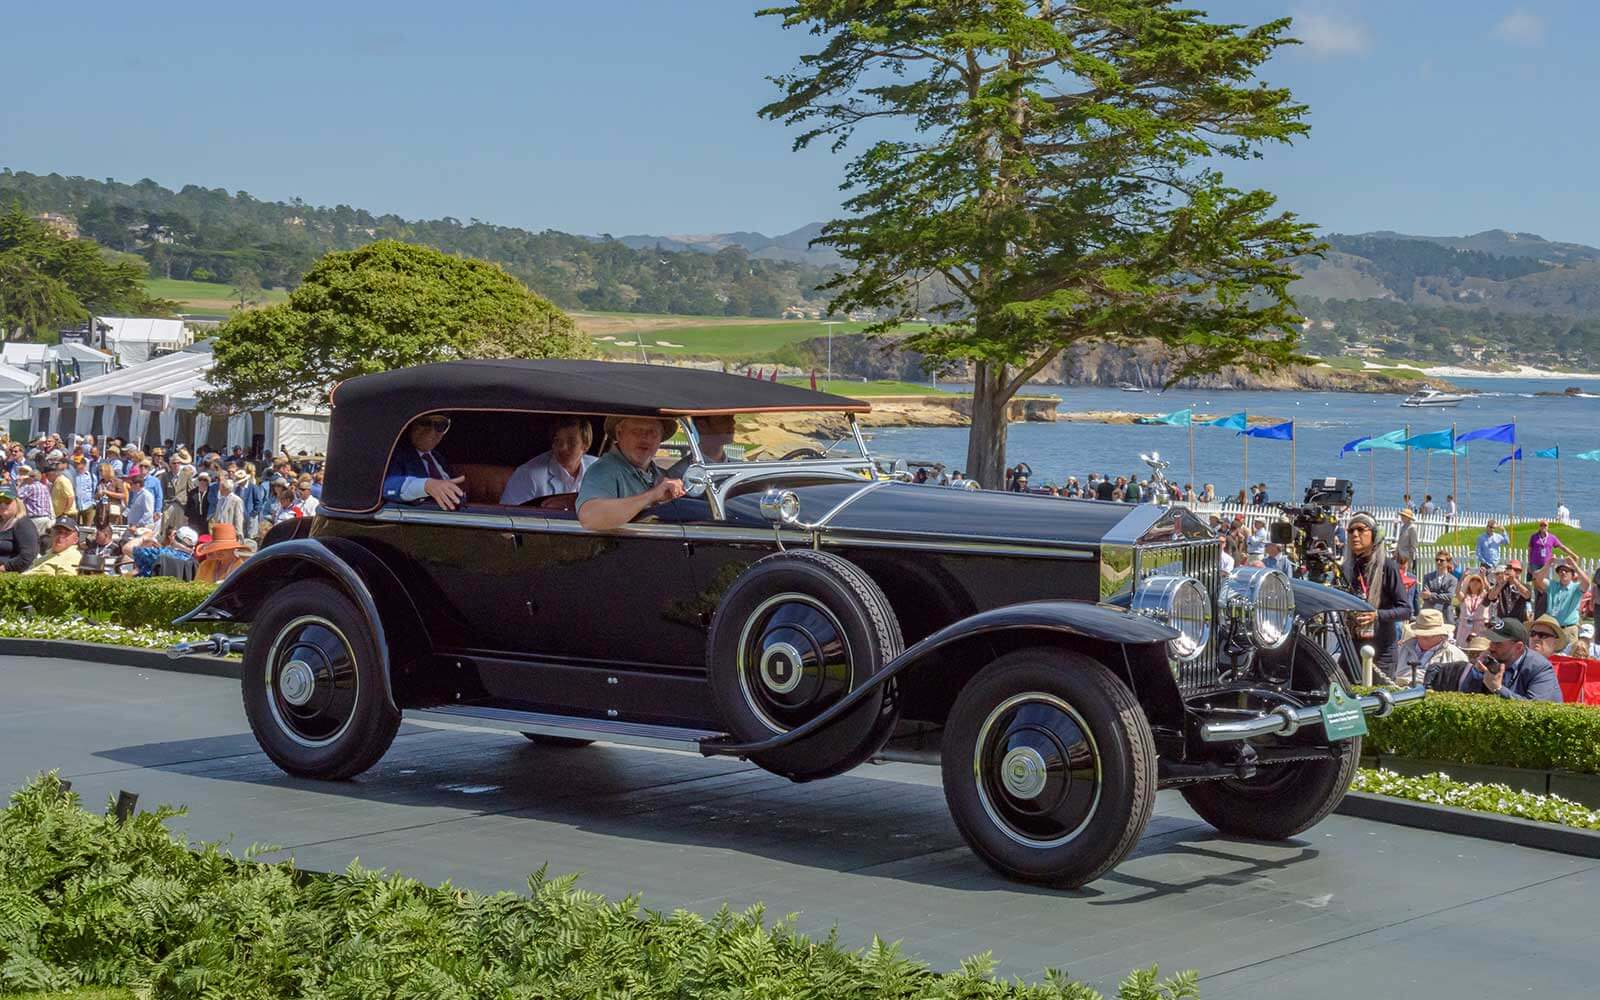 1928 Rolls-Royce Phantom I Brewster Derby Speedster